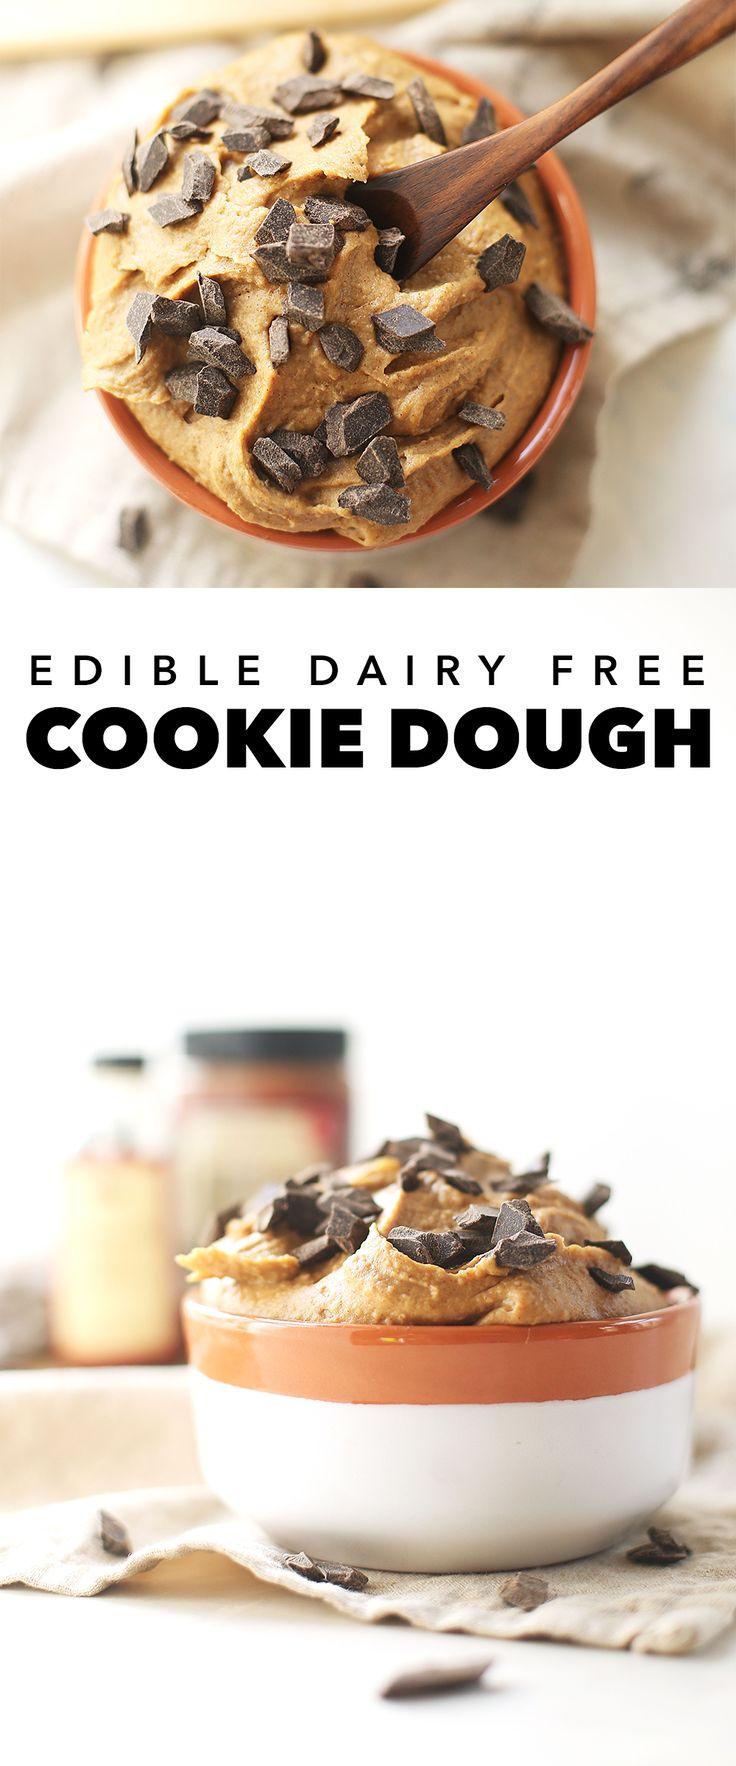 Edible Dairy Free Cookie Dough